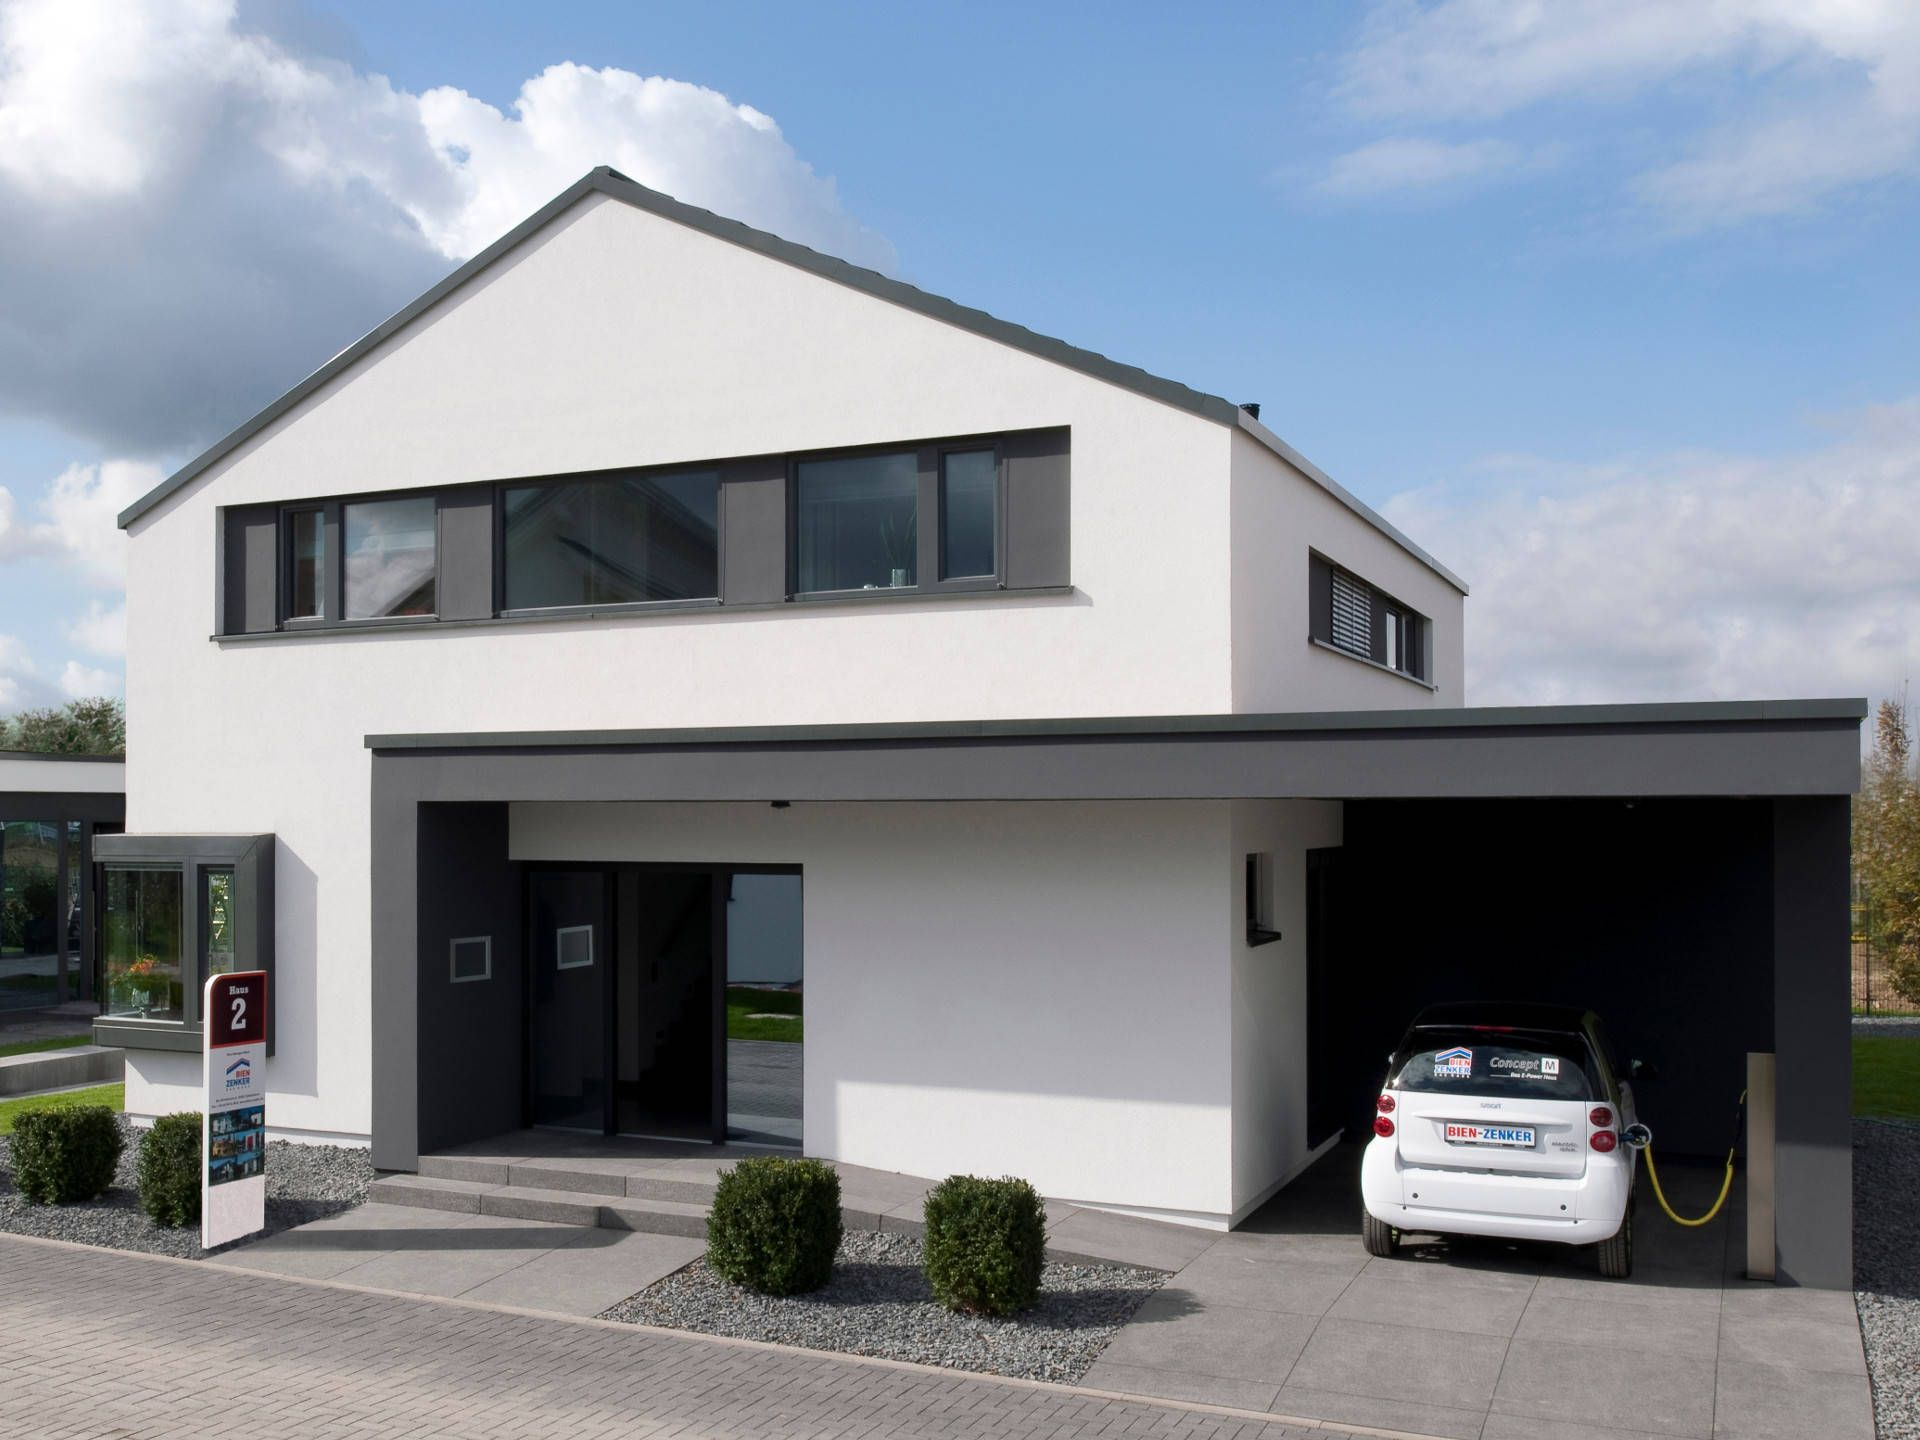 Architekt Plus Energie Haus Nürnberg: CONCEPT-M 172 Köln